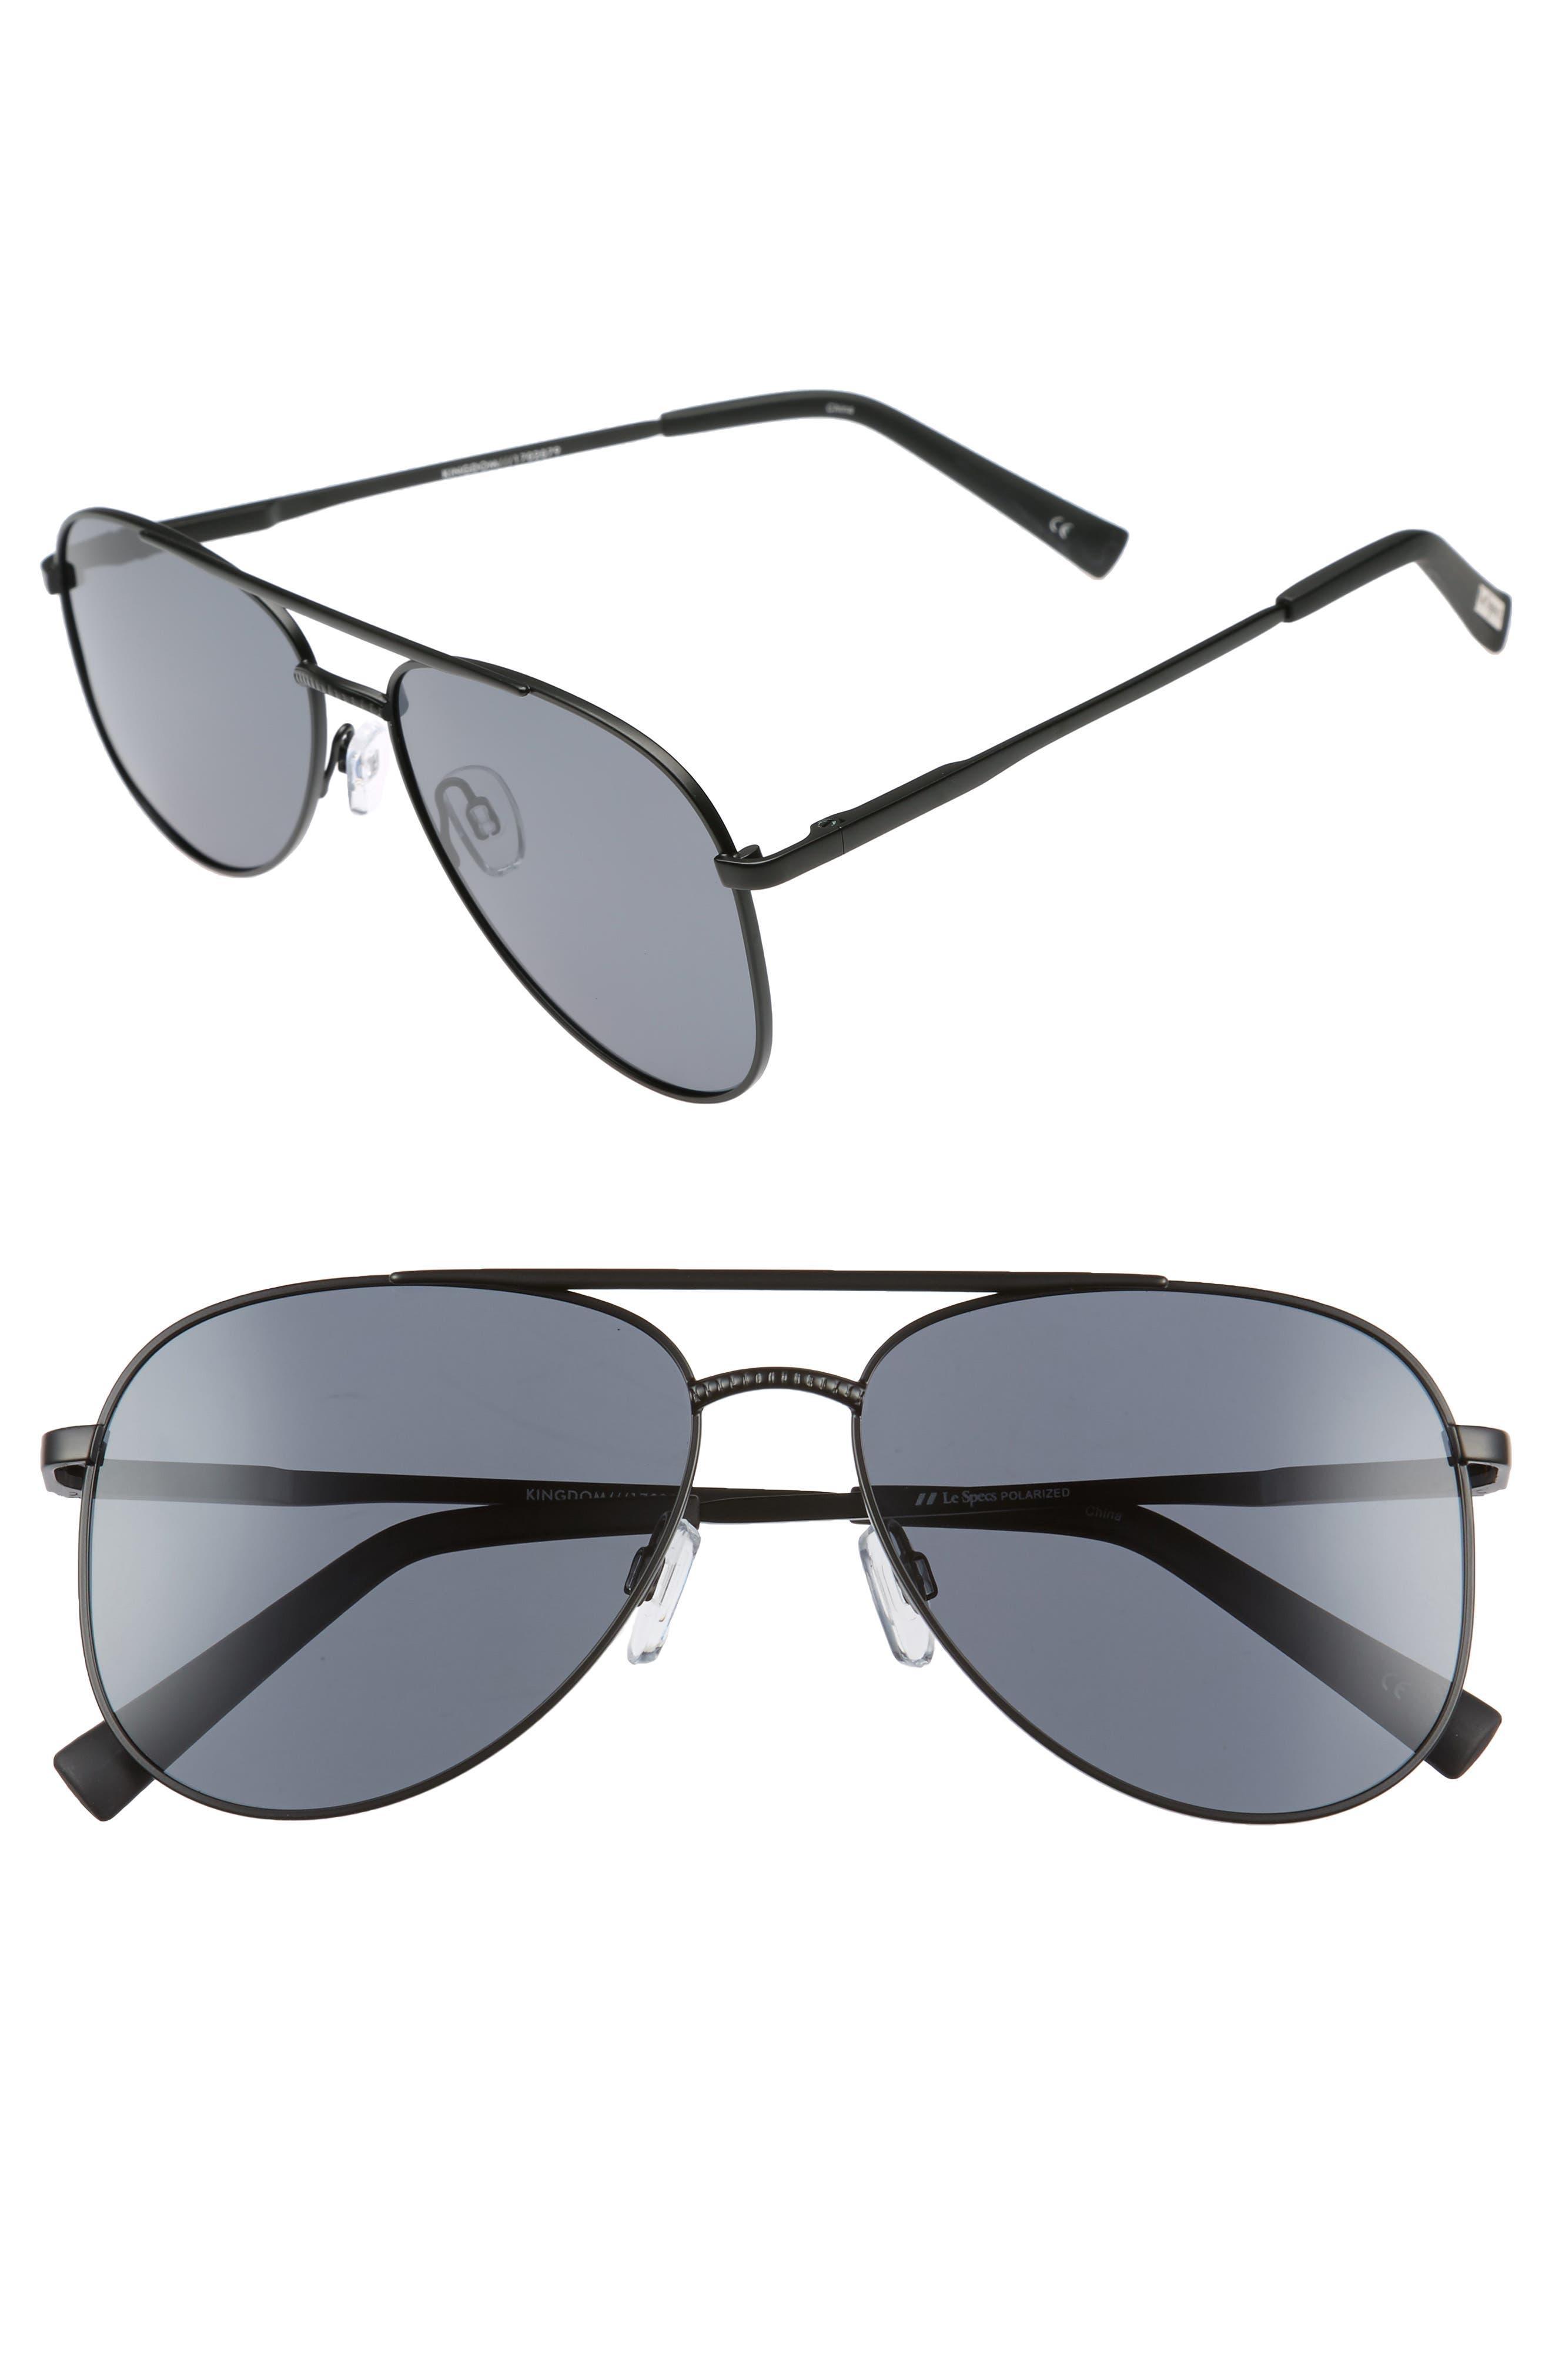 Main Image - Le Specs Kingdom 57mm Polarized Aviator Sunglasses